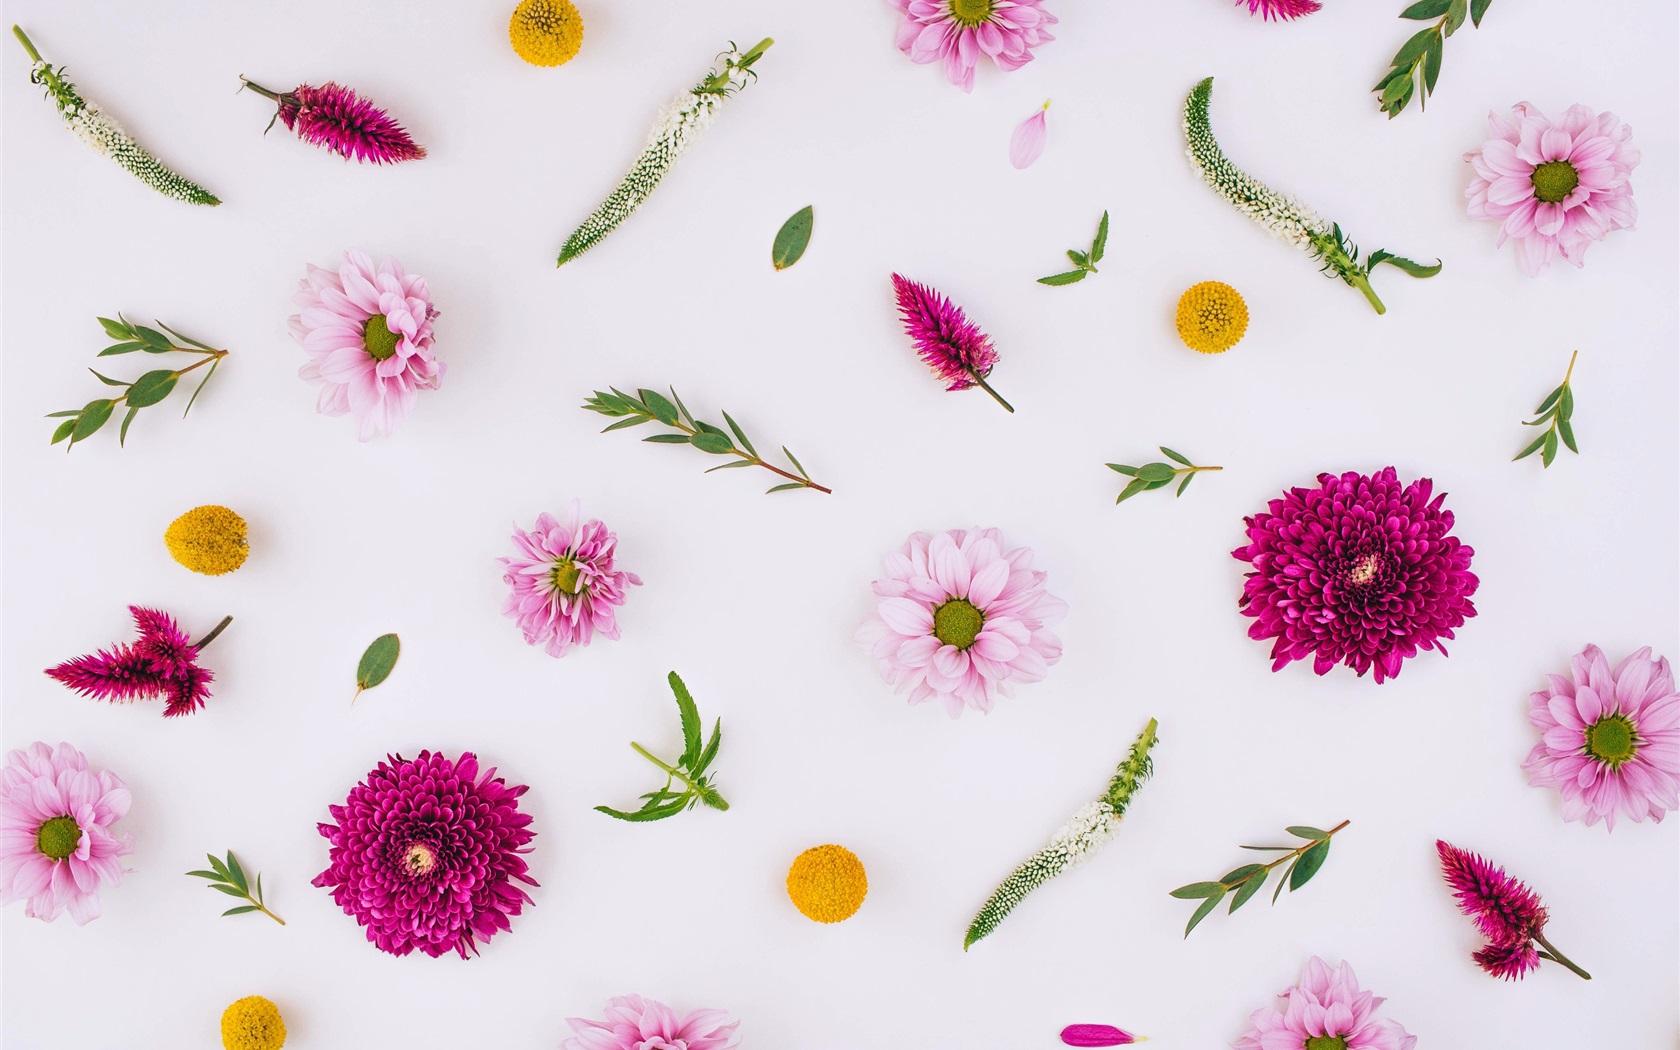 Fondos De Pantalla Hd Flores: Flores Rosadas, Crisantemo, Fondo Blanco Fondos De